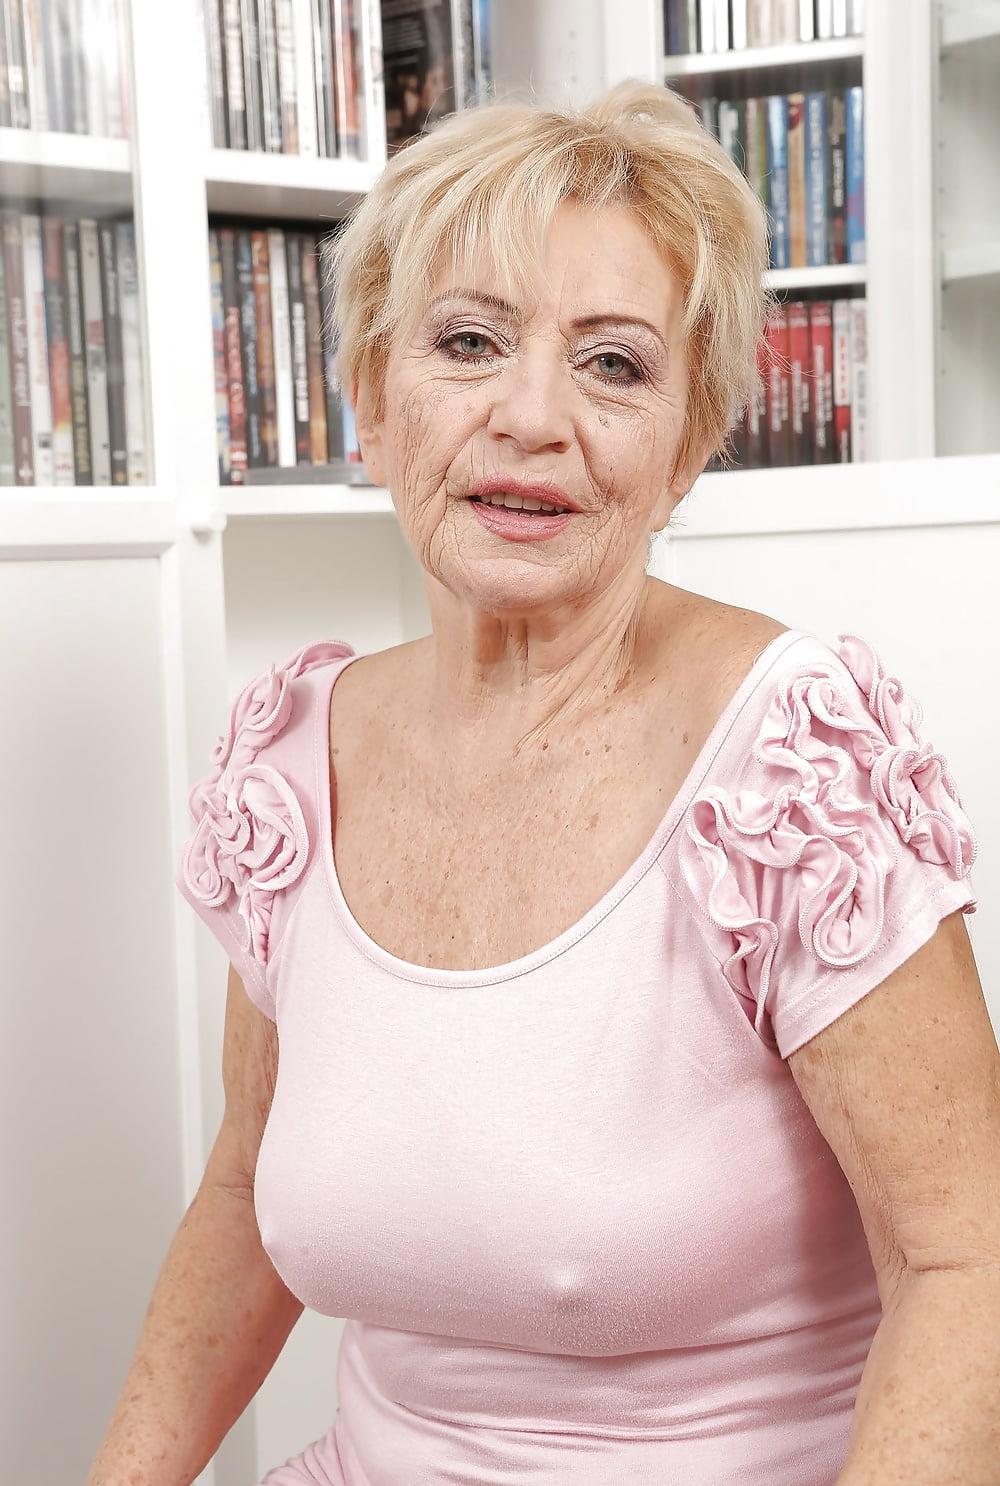 Granny photos nude, danica patrick nude photos